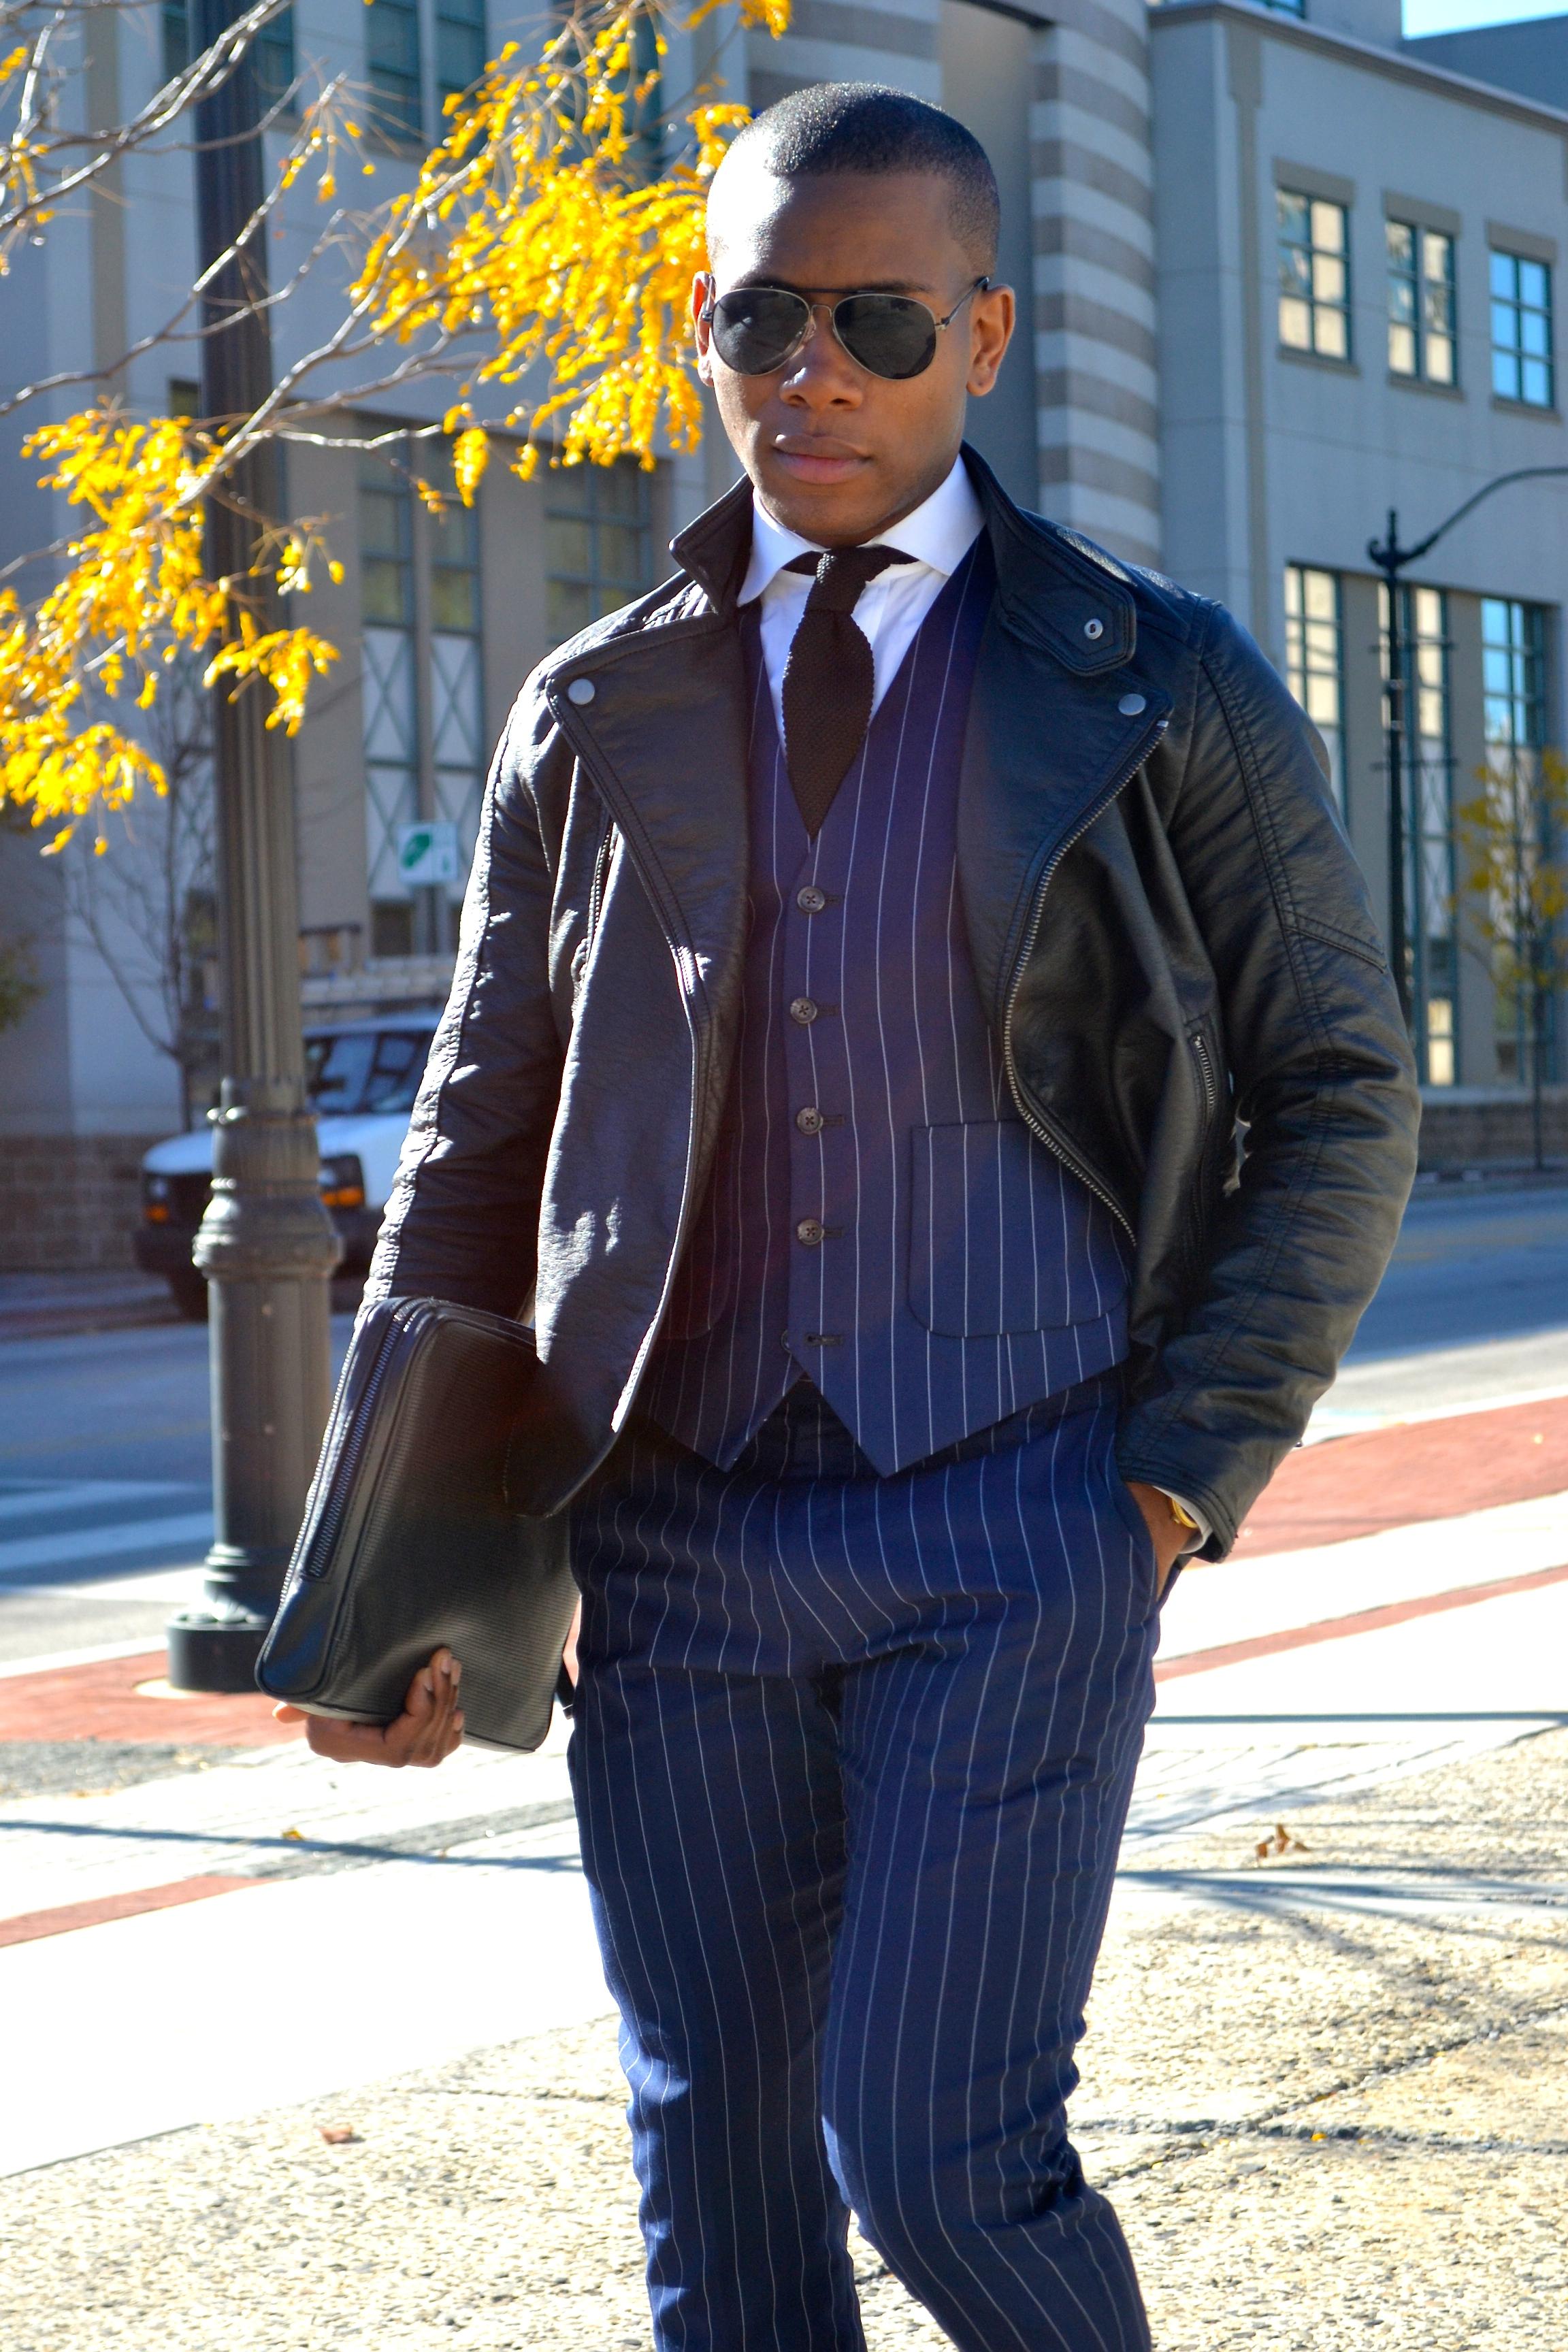 Sabir M. Peele of Men's Style Pro in Imparali Chalk Stripe Suit